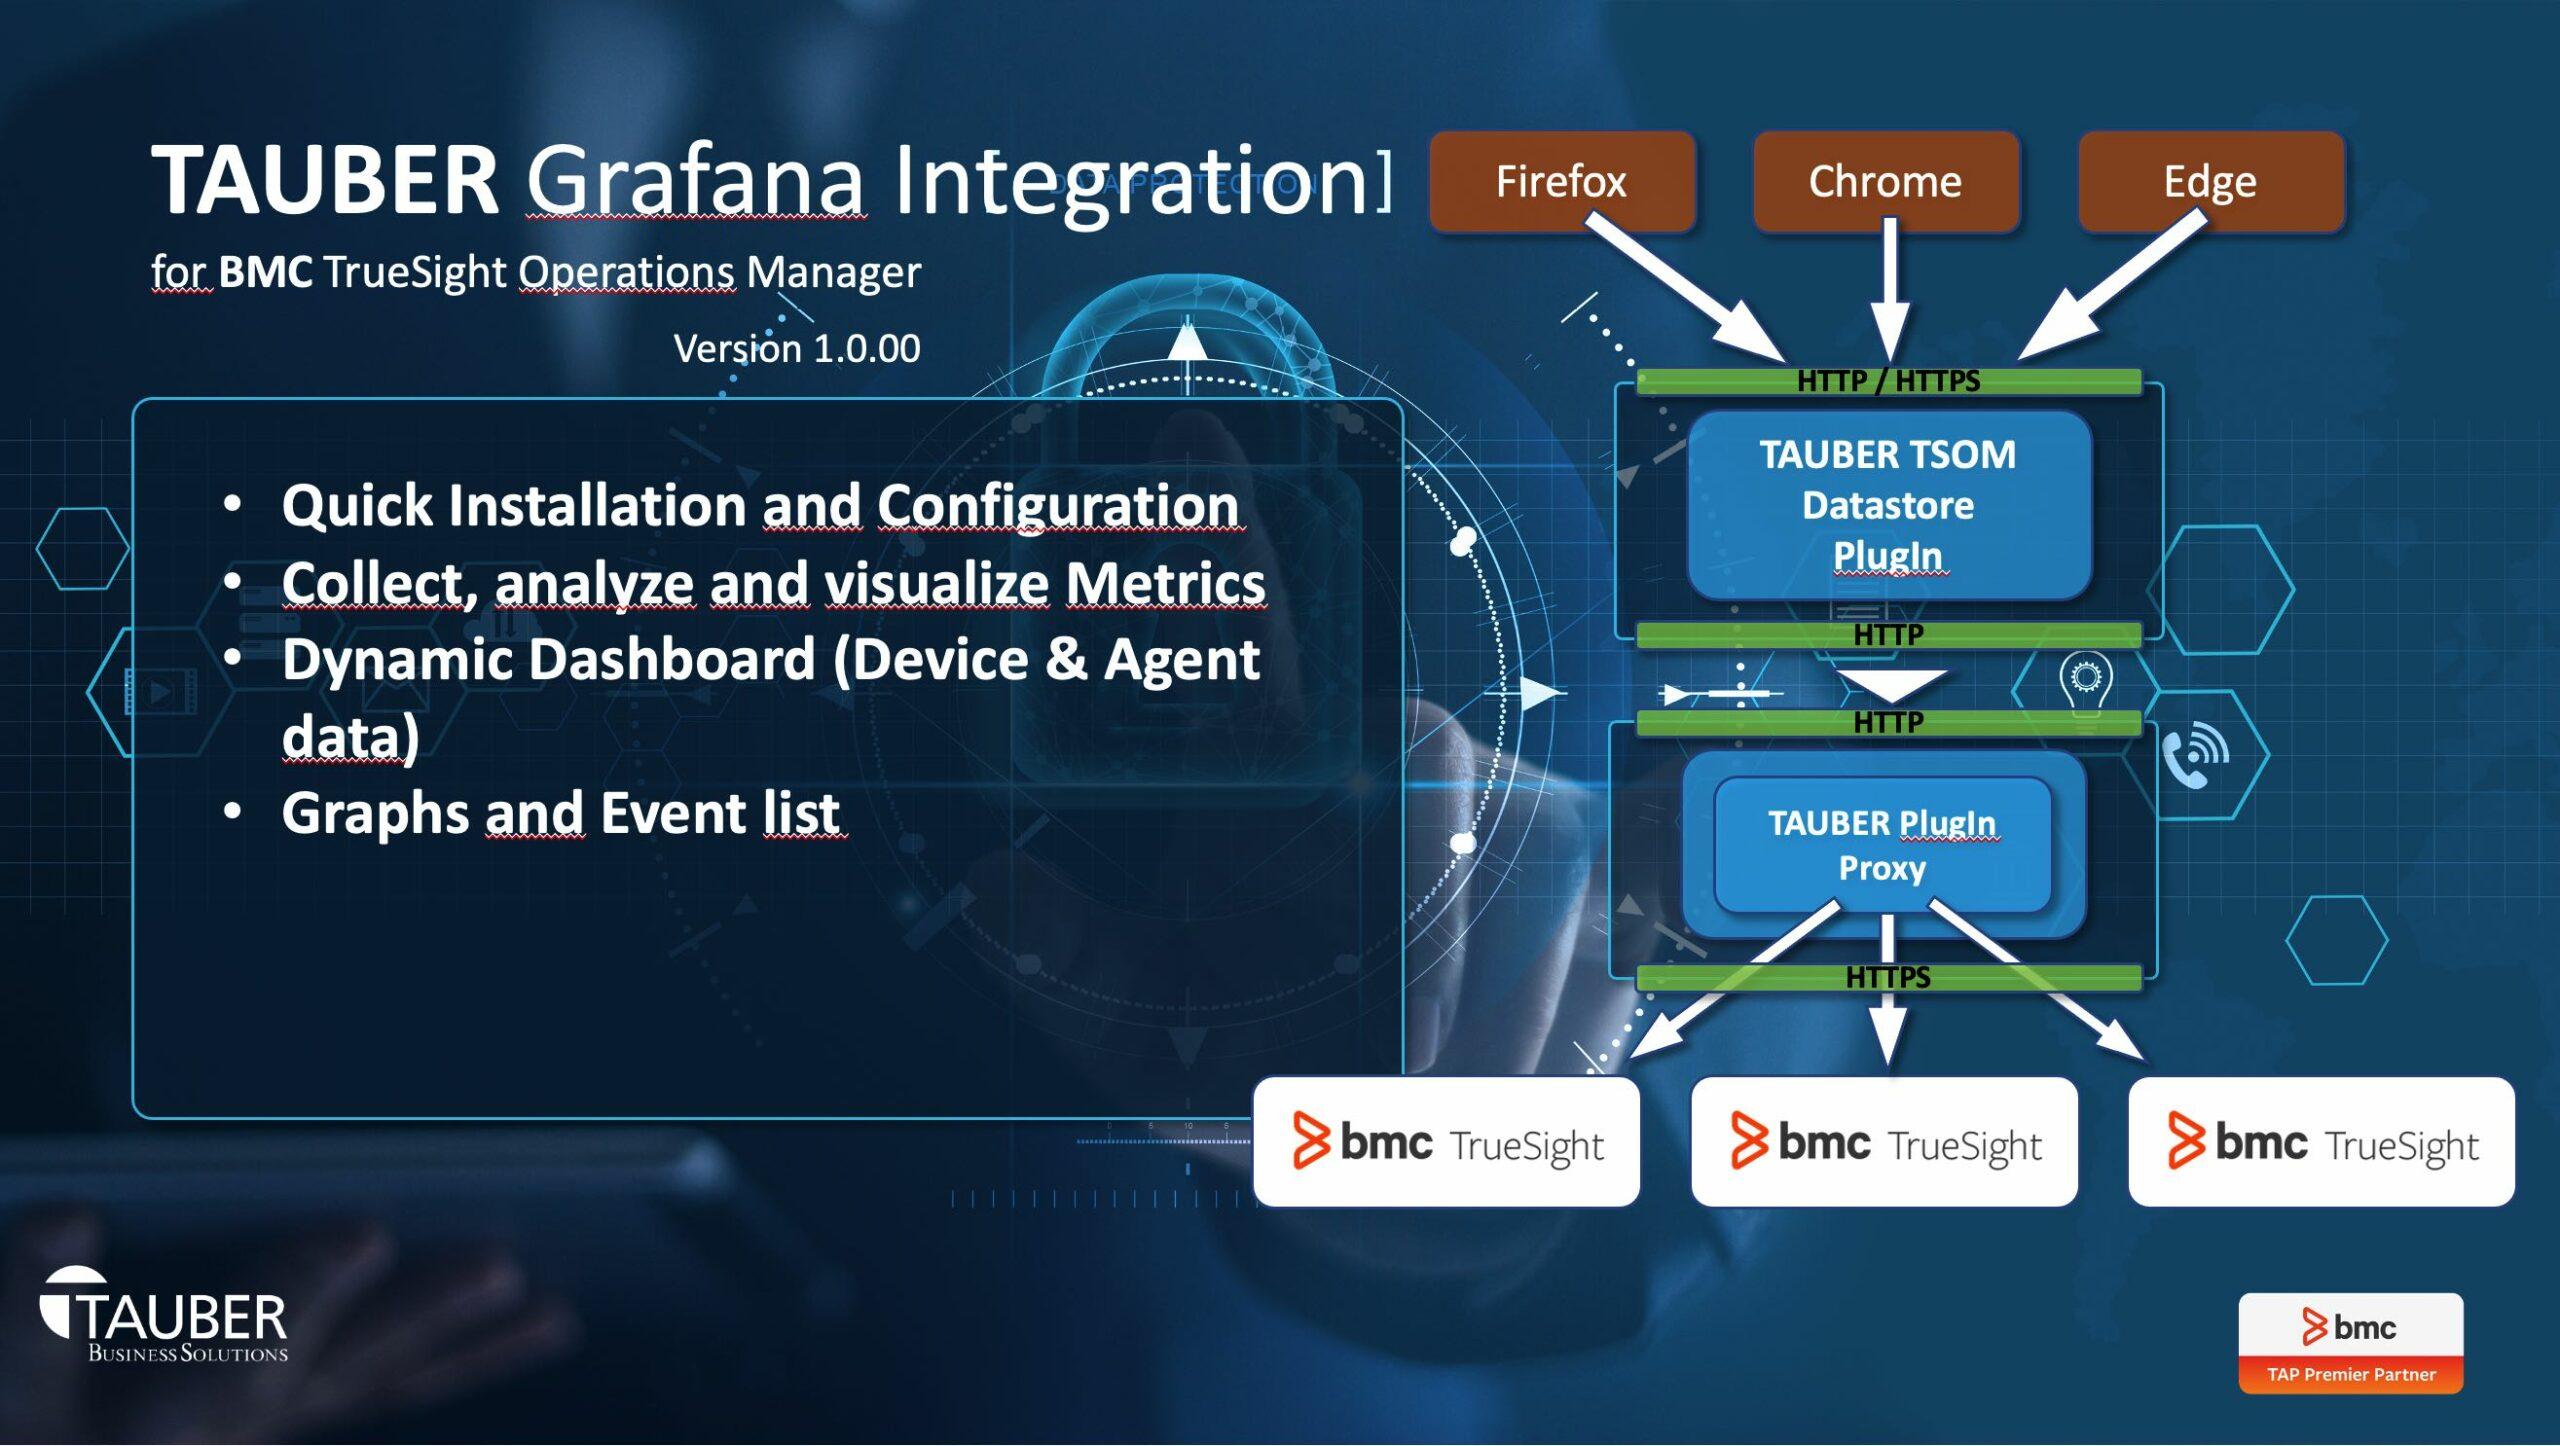 TAUBER Grafana Integration Features